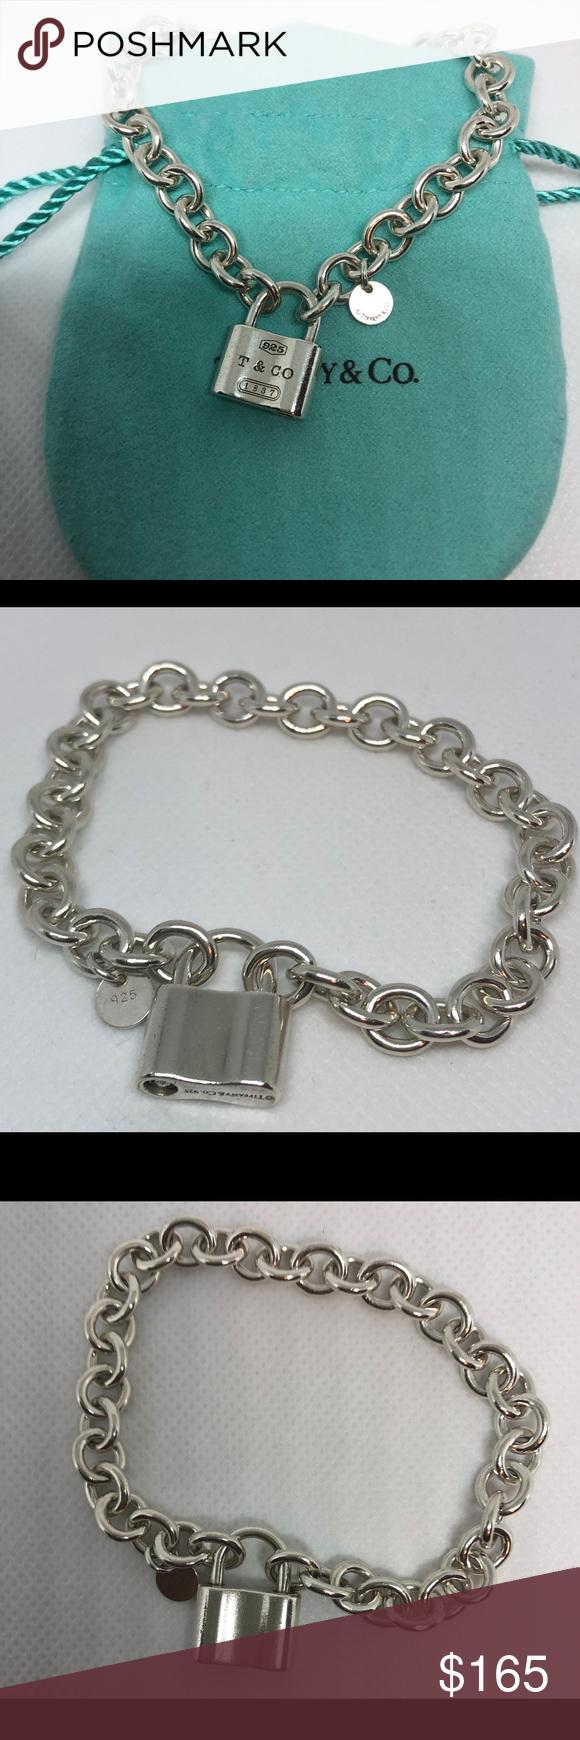 31f0804b2 TIFFANY 1837 Padlock Charm Chain Link Bracelet 100% Authentic Tiffany & Co  1837 Padlock Bracelet